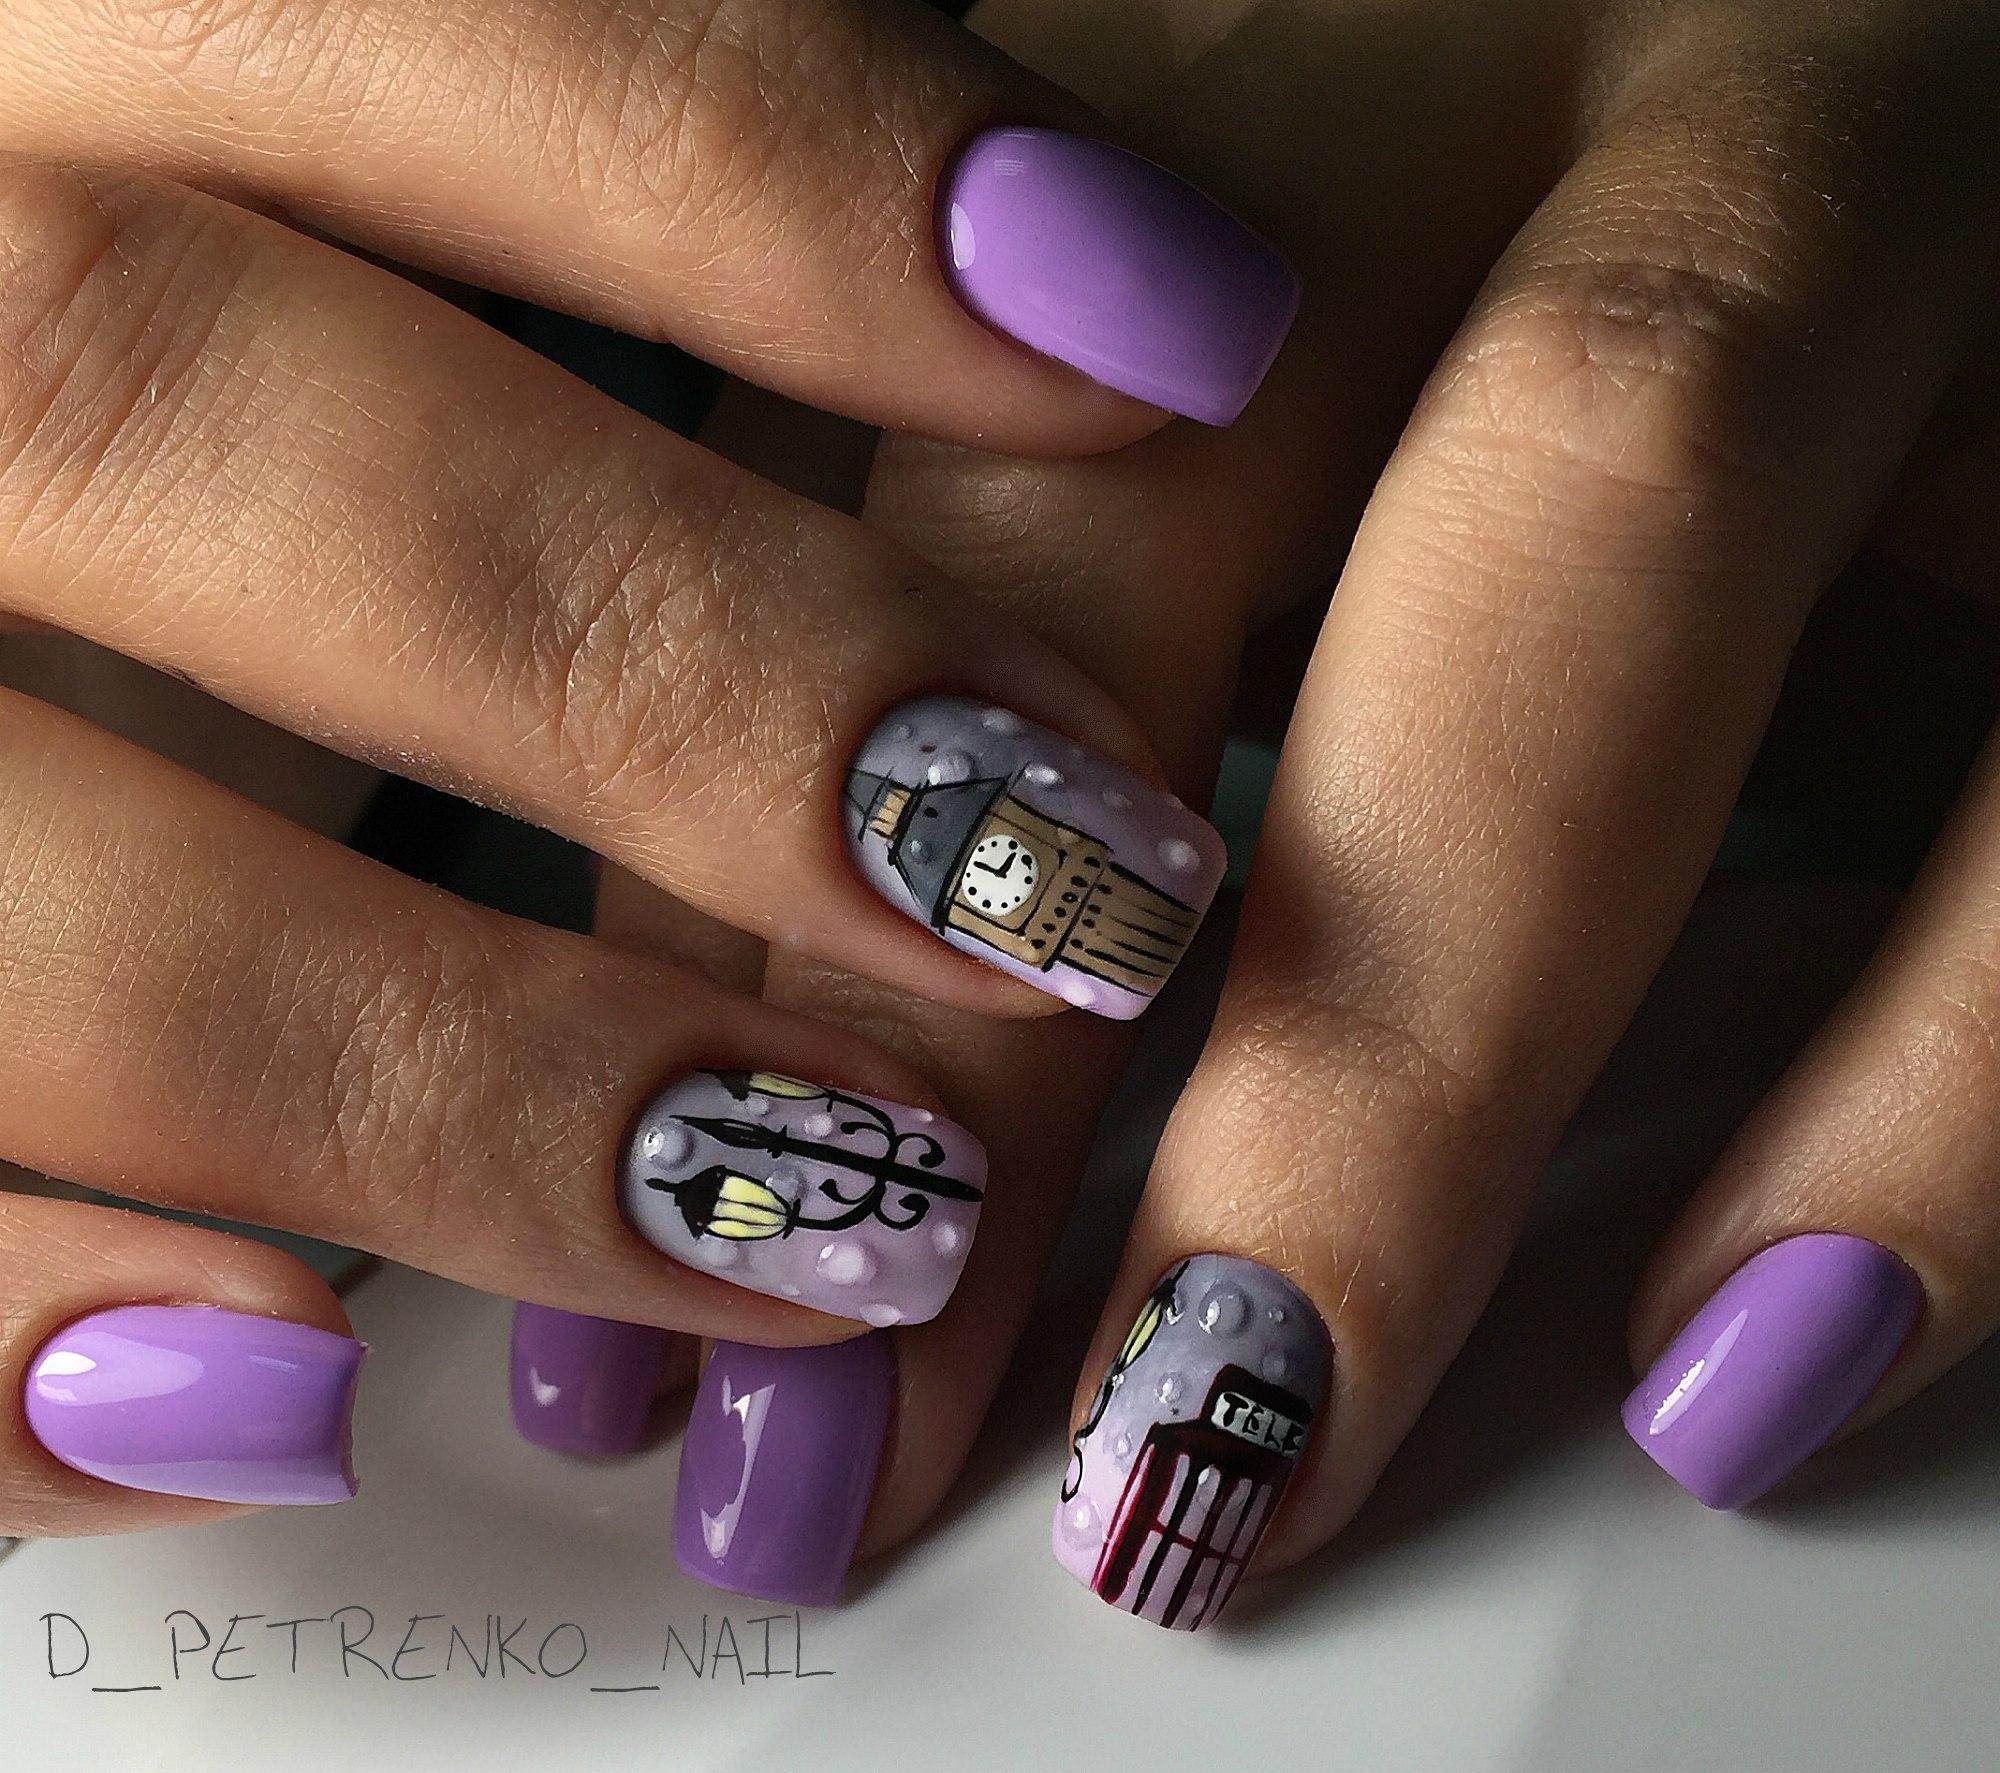 Капли на ногтях маникюр